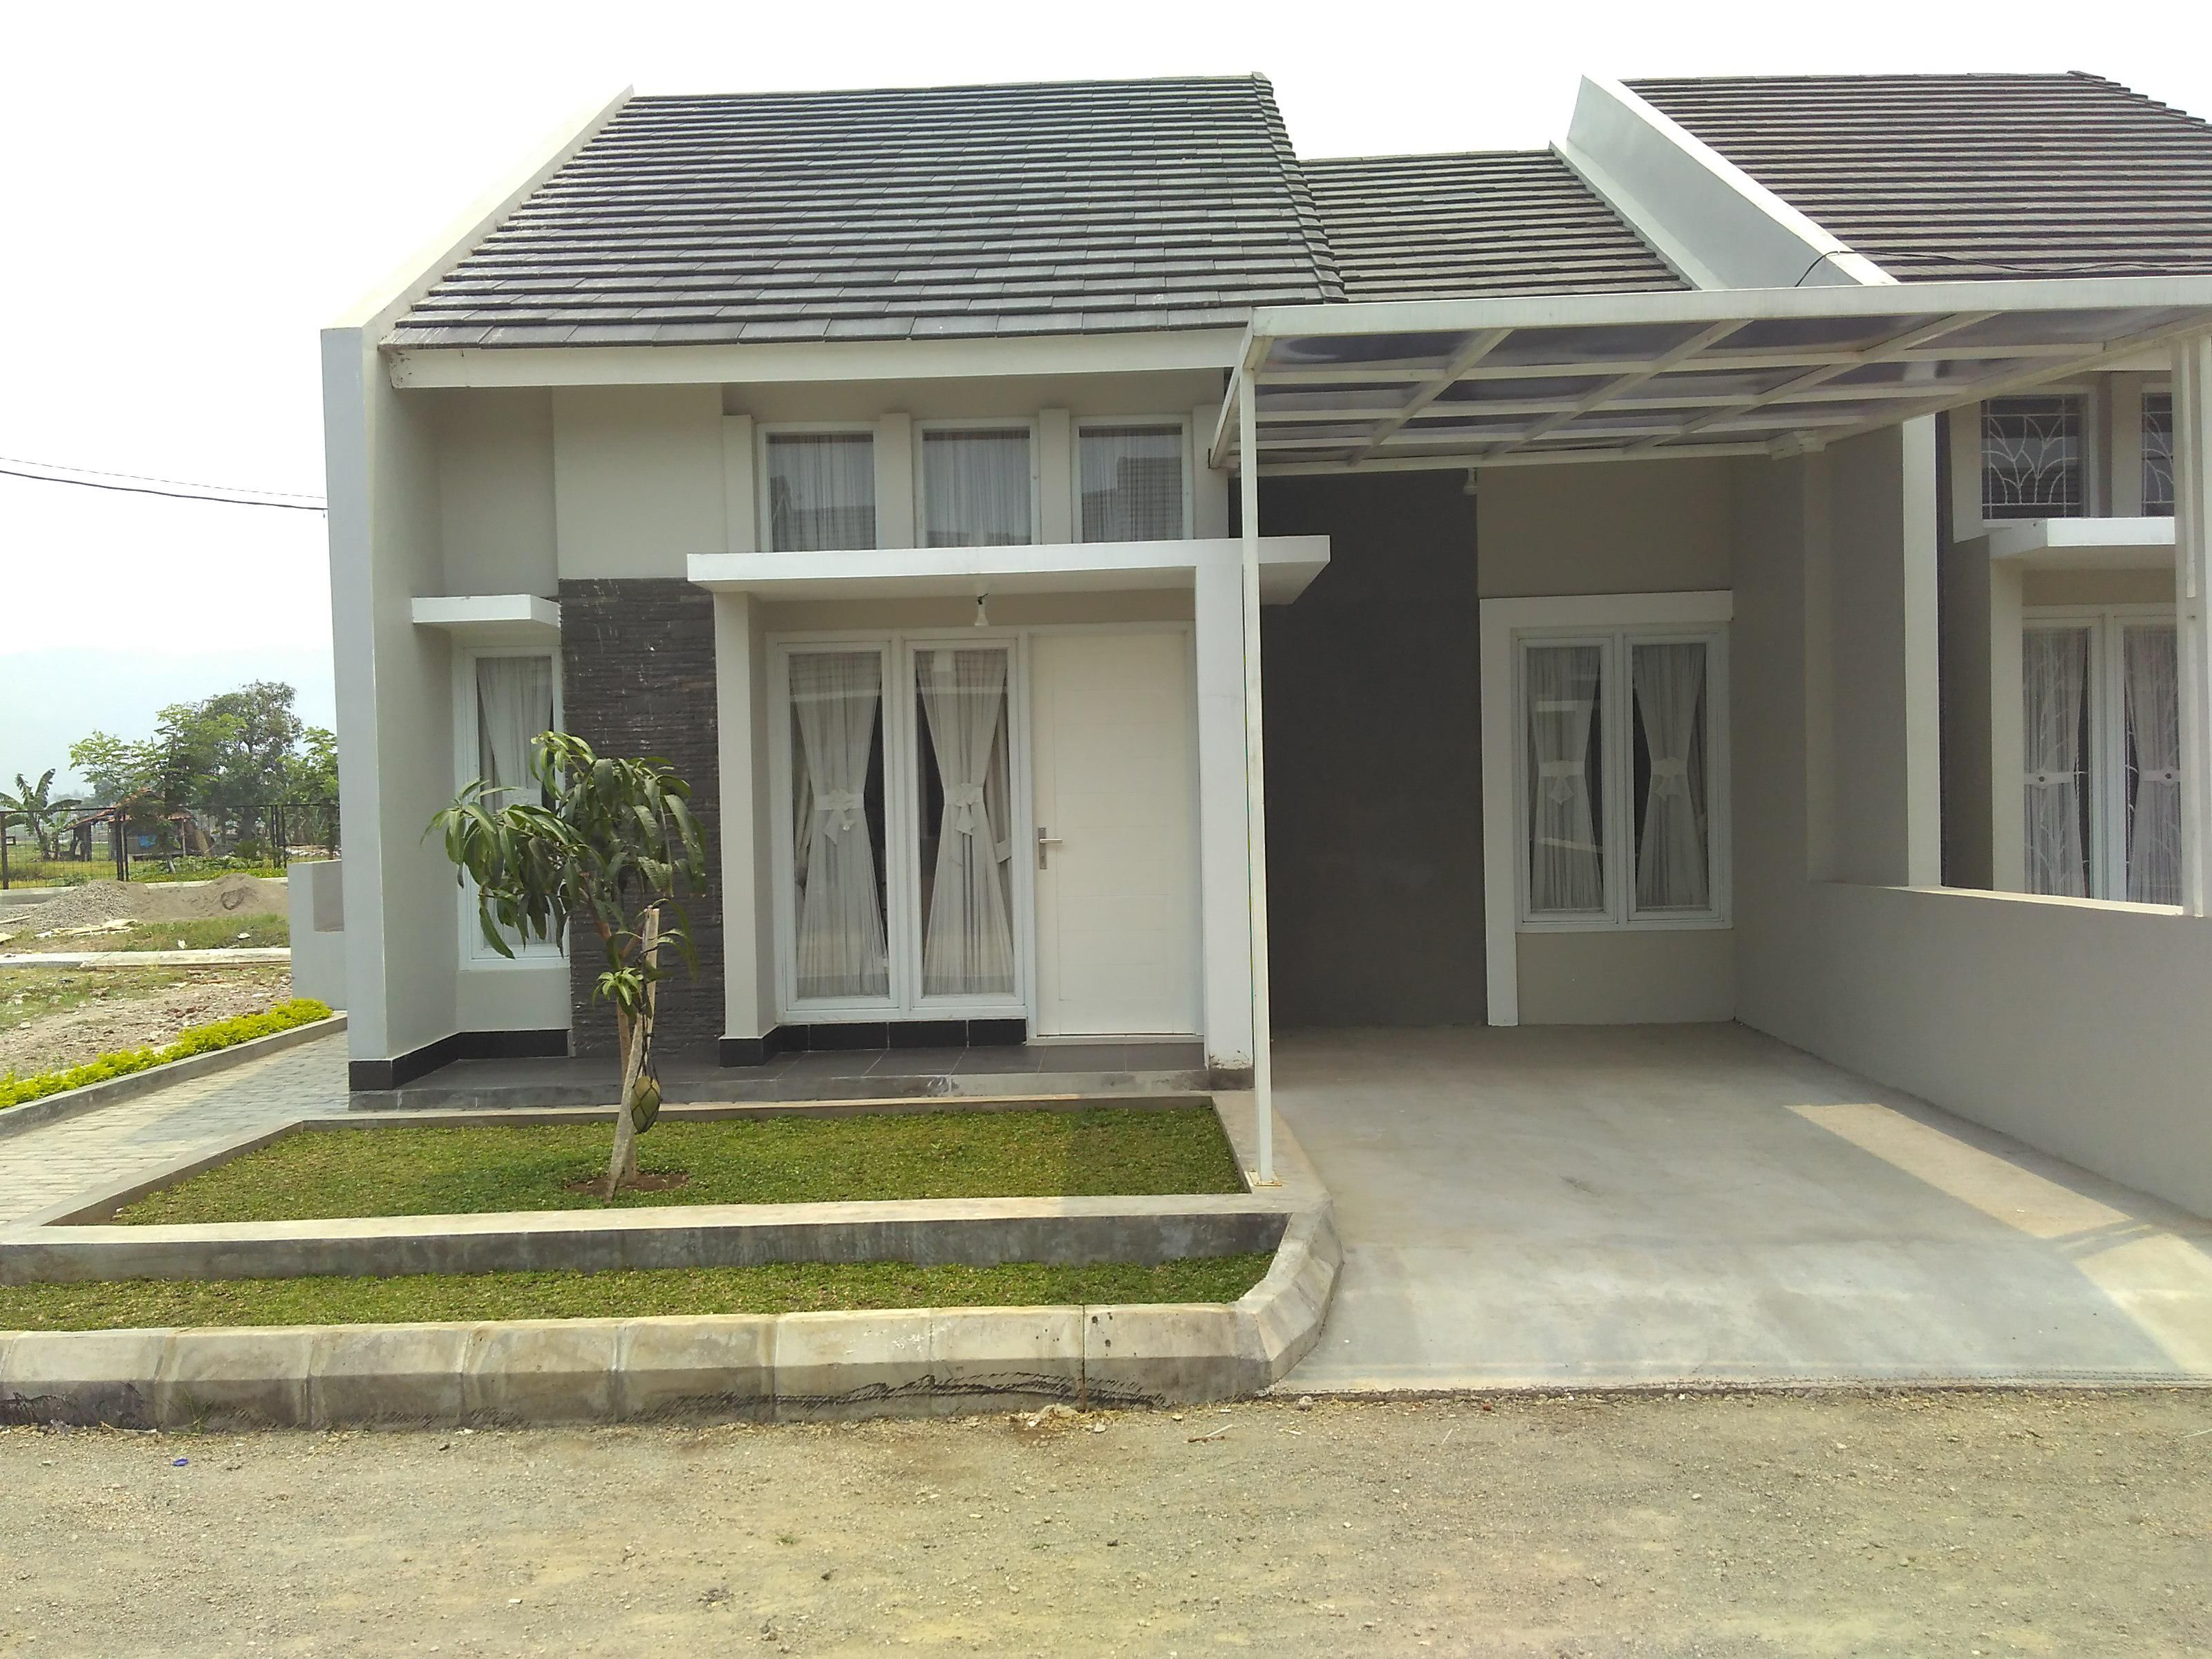 Rumah Cluster dekat Tol Buah Batu Bandung | Iklanbaris.id on